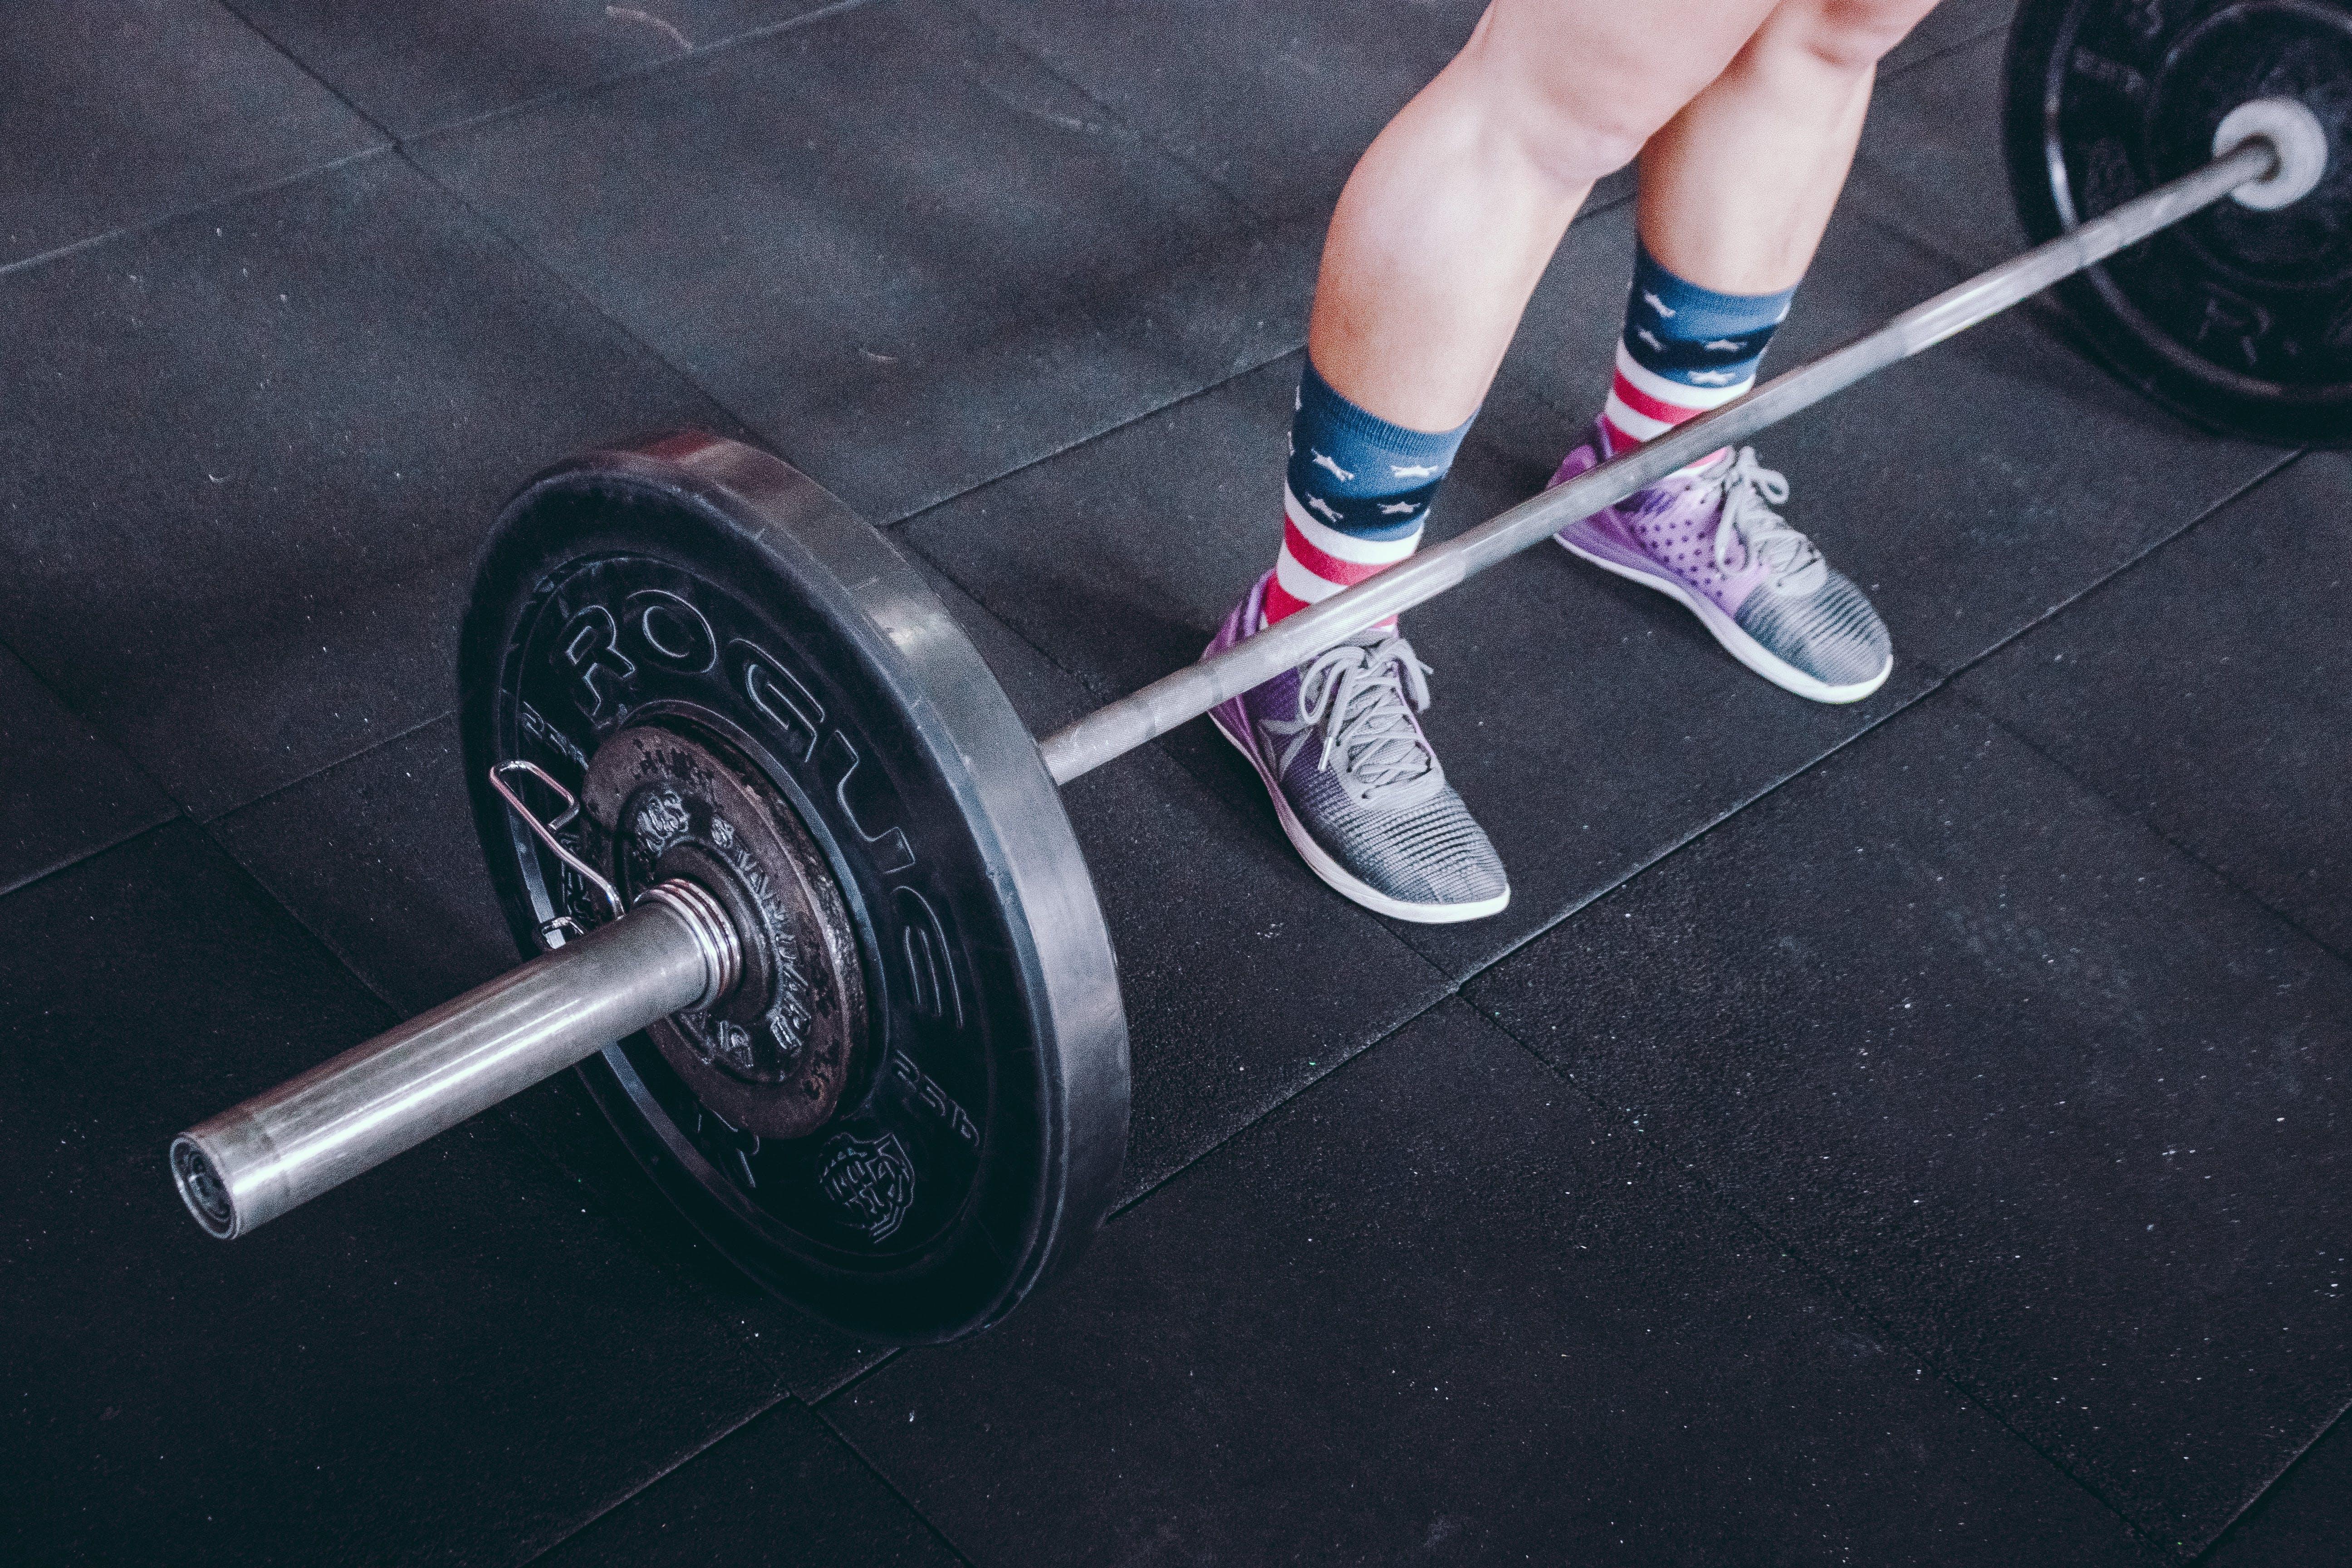 Fotos de stock gratuitas de acero, adentro, atleta, barra de pesas